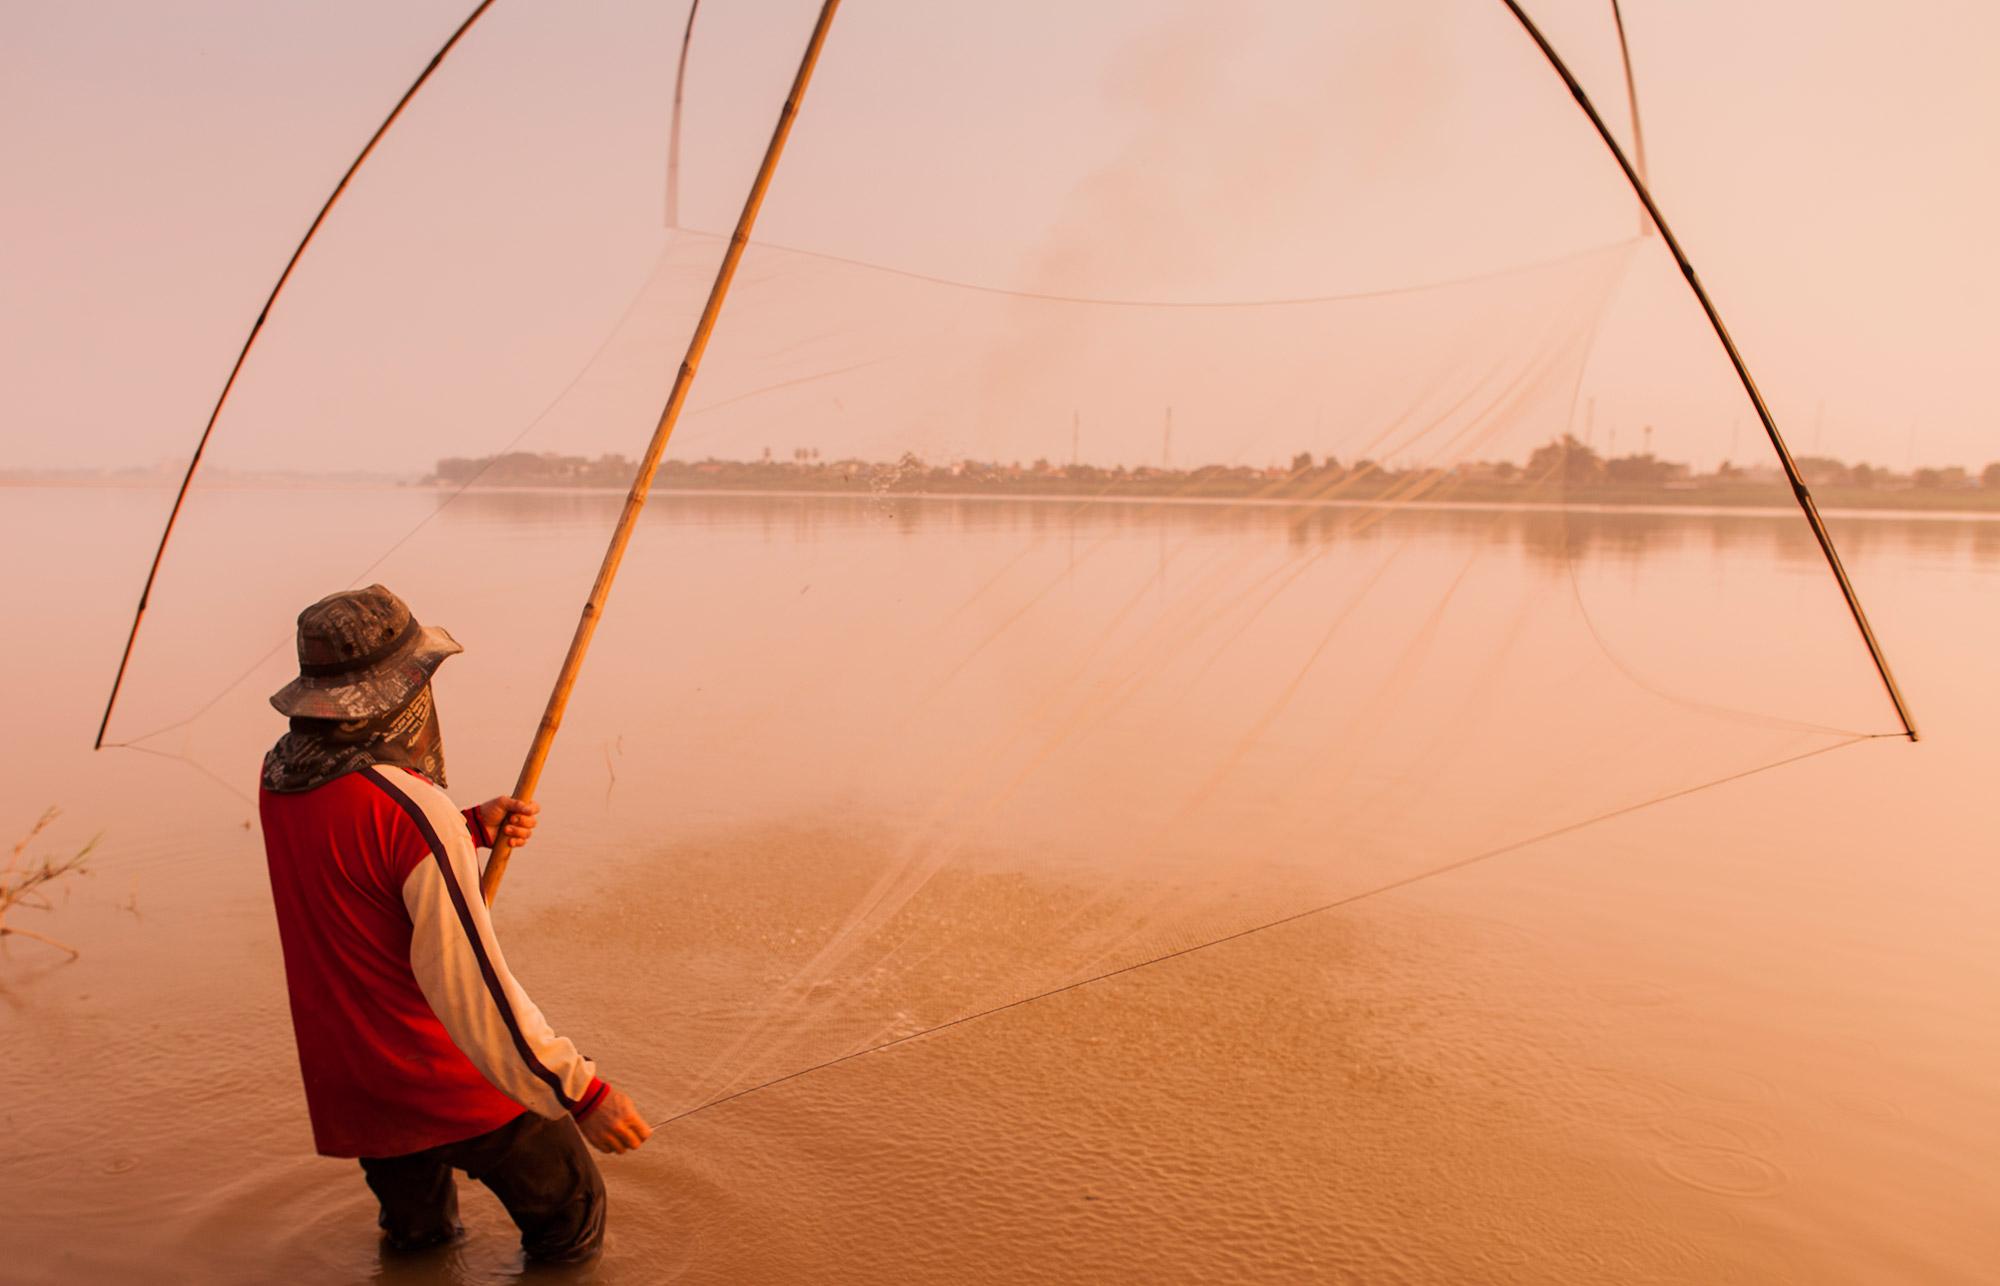 Fisherman on the Mekong in Laos